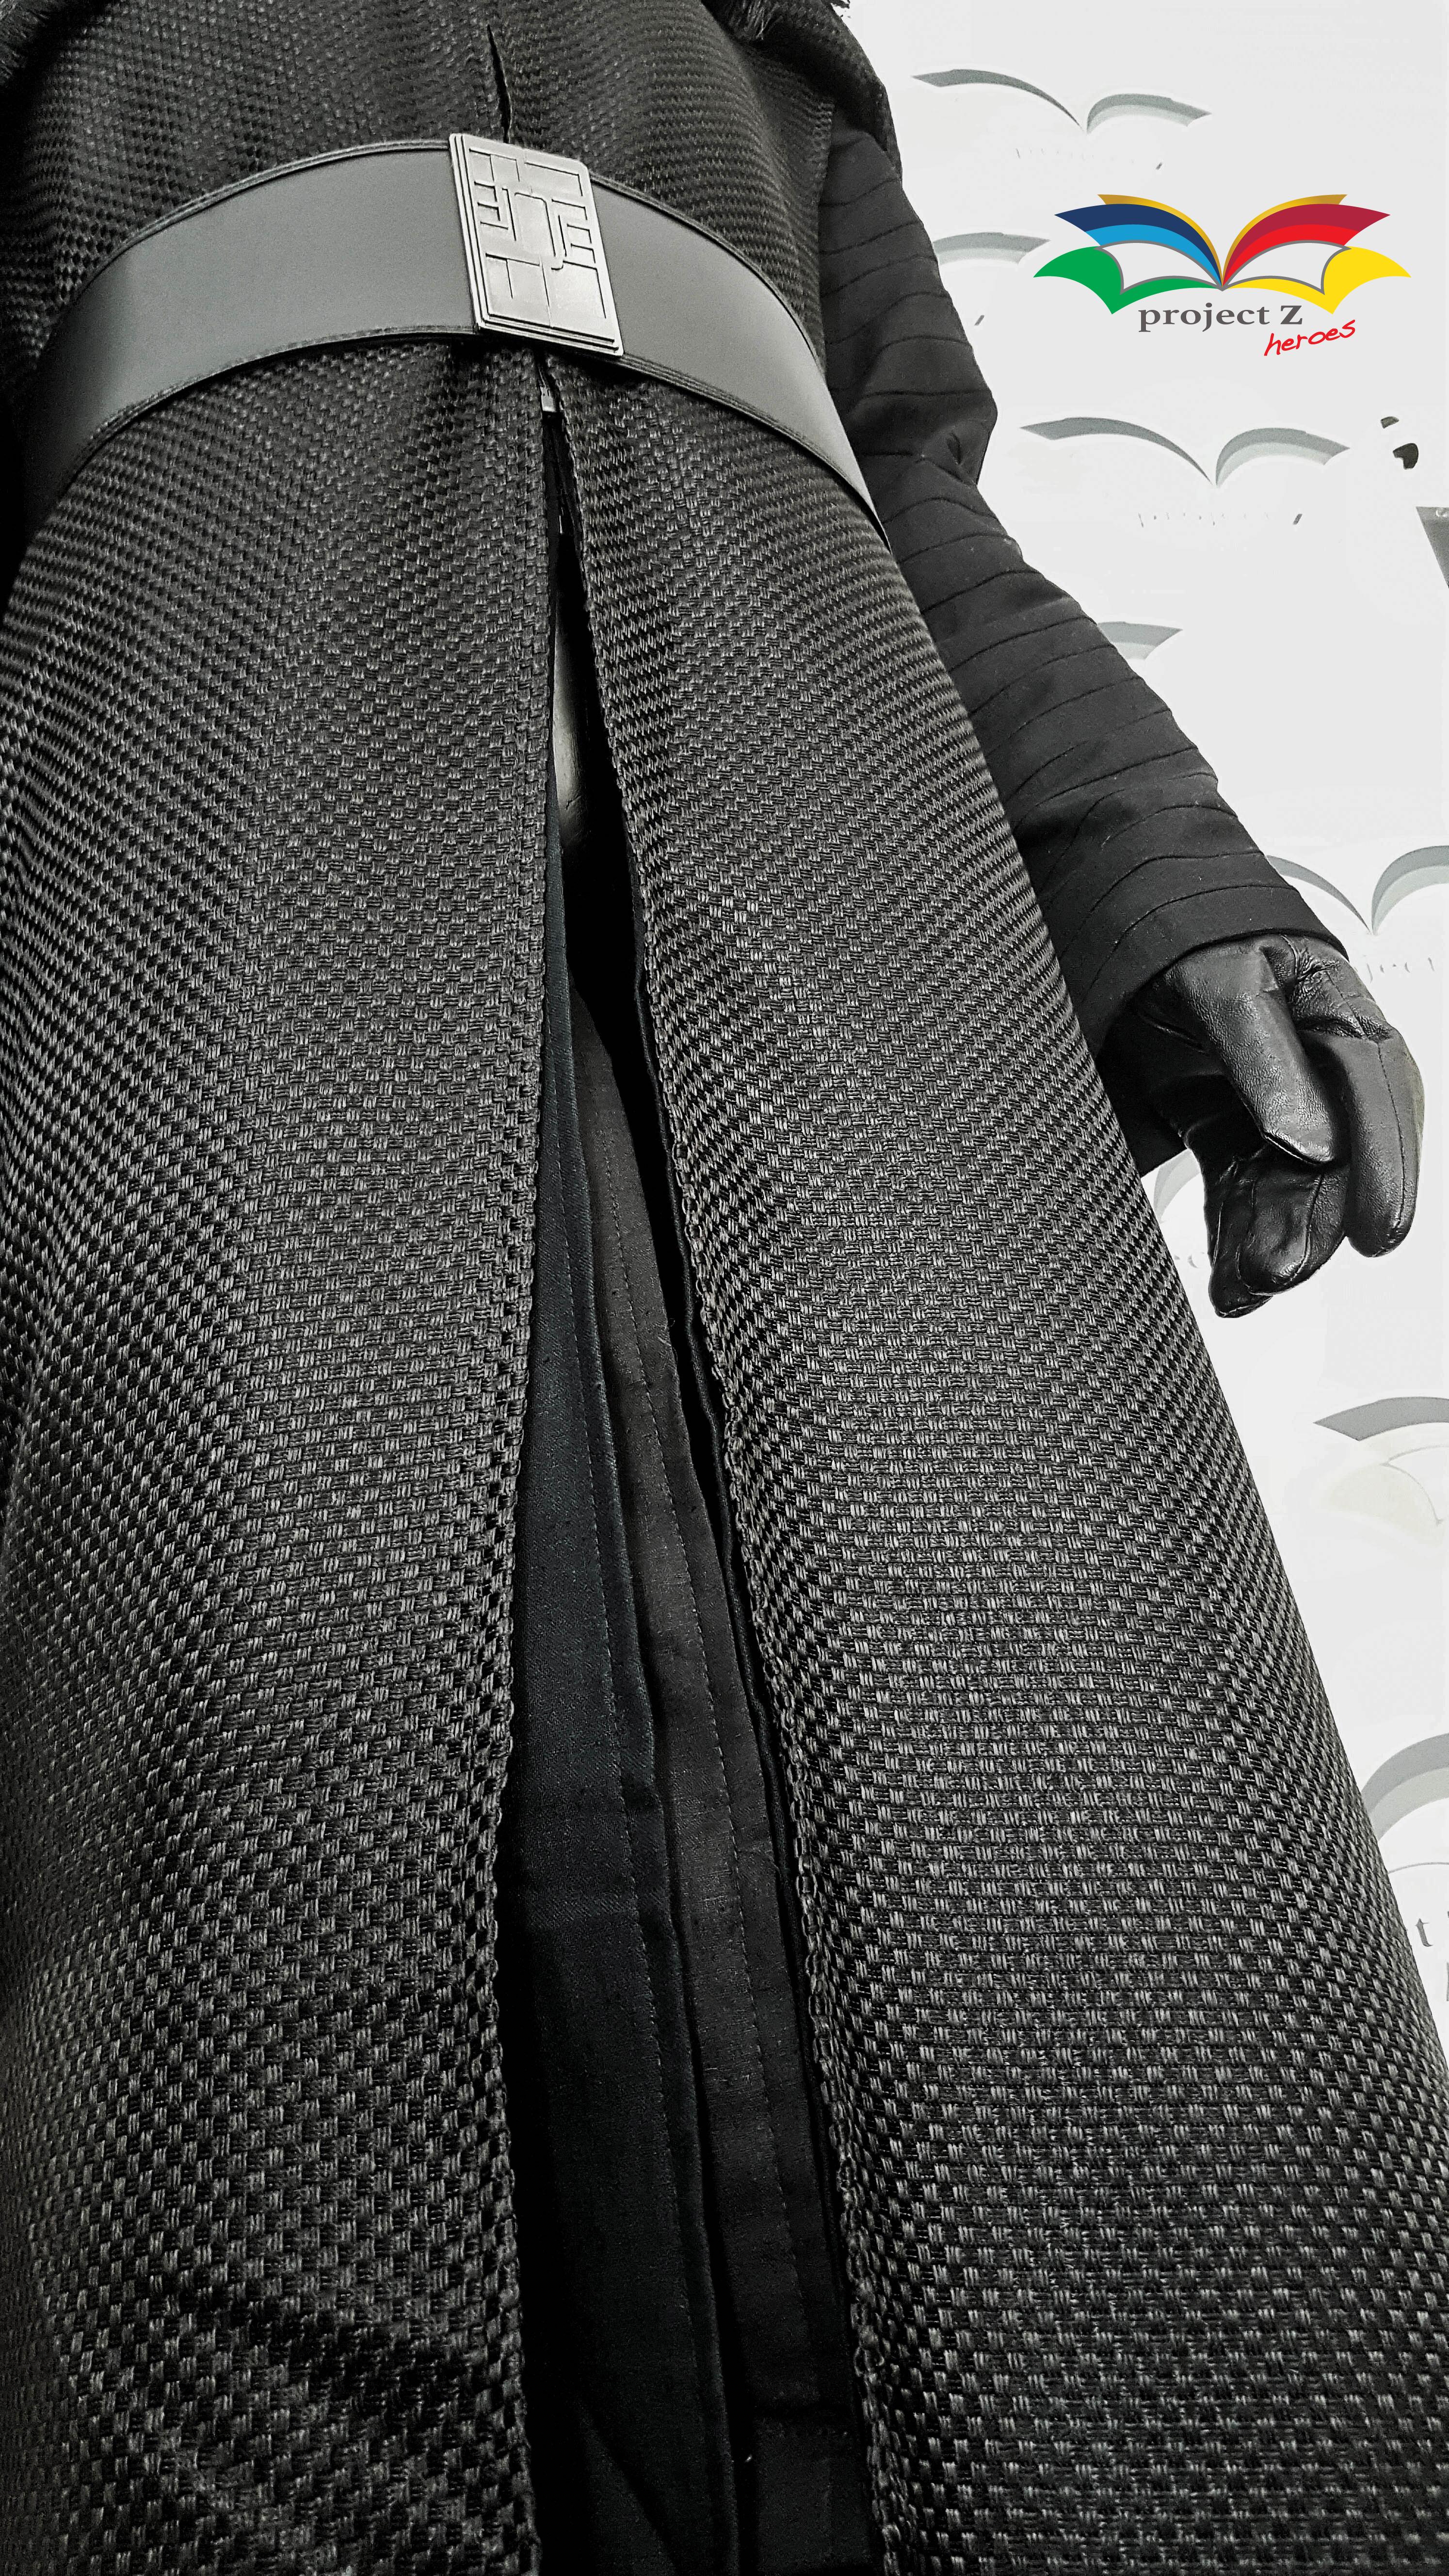 Kyro Ren Costume Coat detail low angle